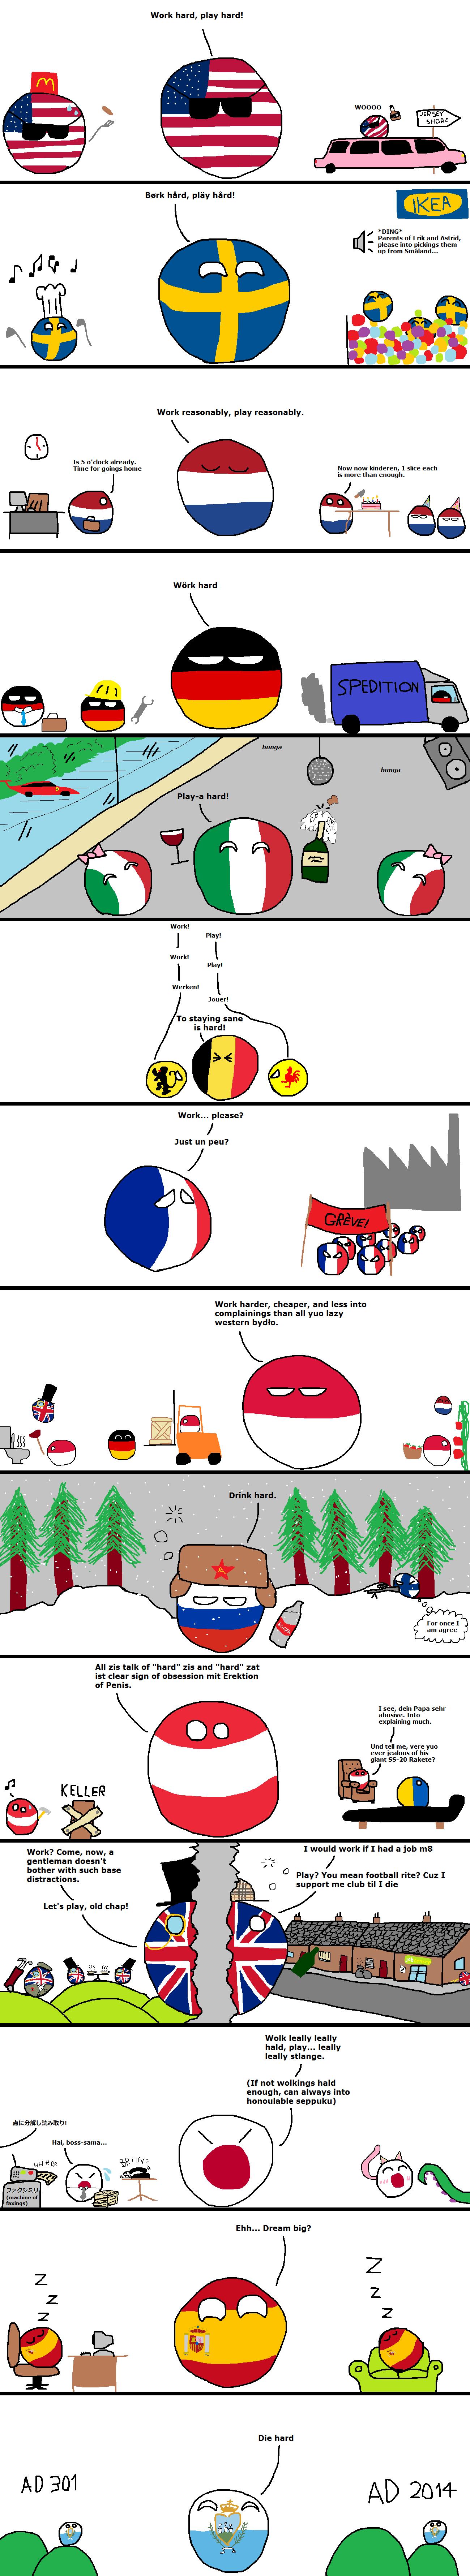 country-balls-work-ethics-around-the-world